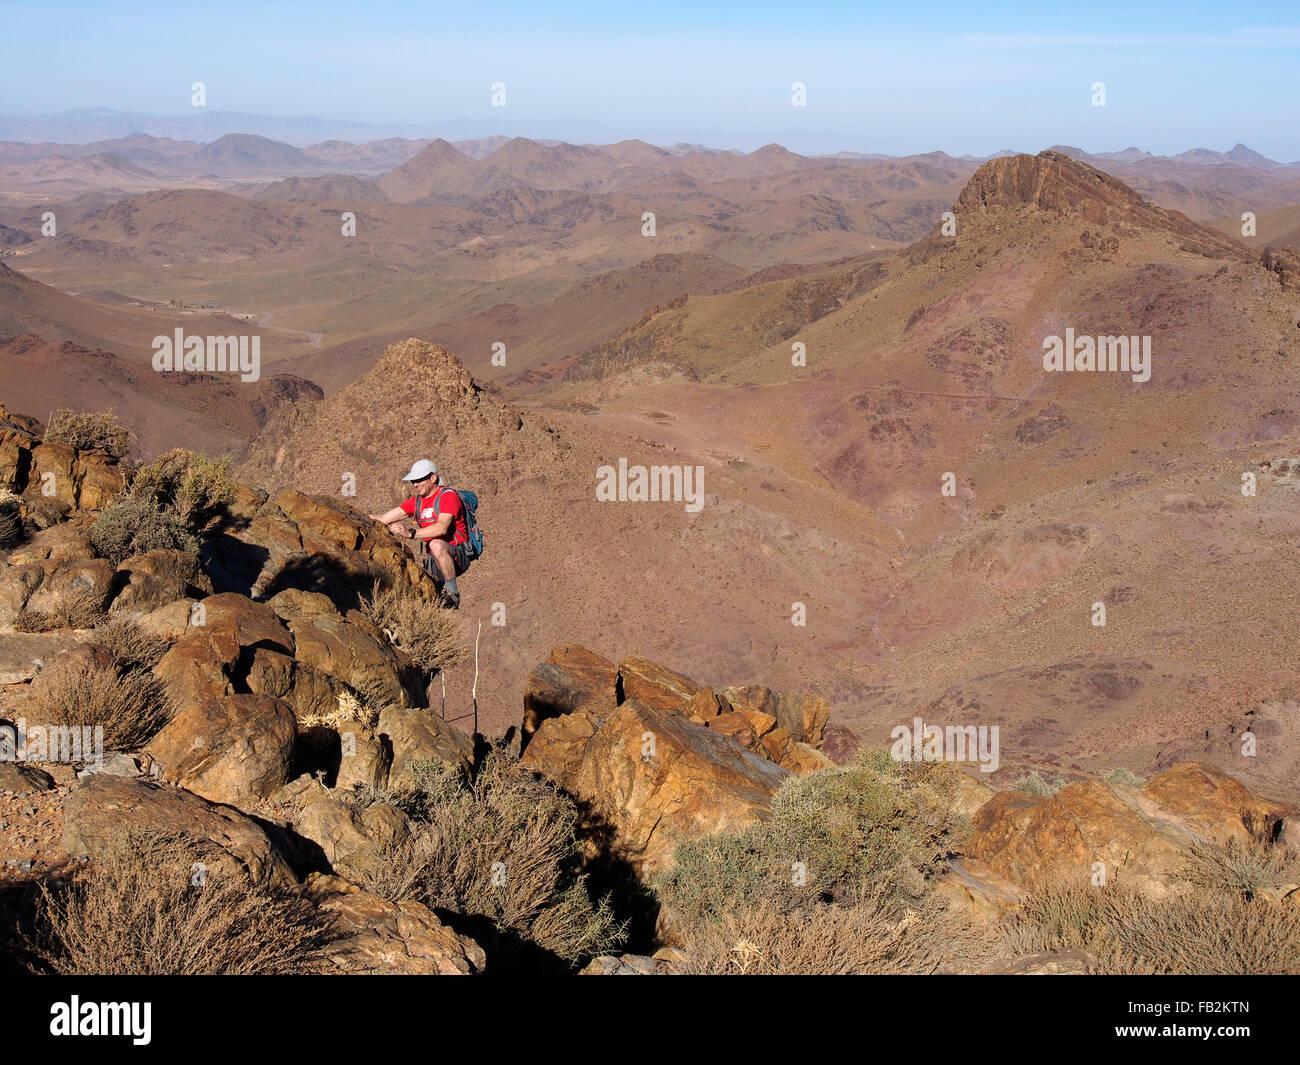 ascending NE ridge of 2350m peak SE of Tanemlalt, Jbel Saghro, Morocco - Stock Image